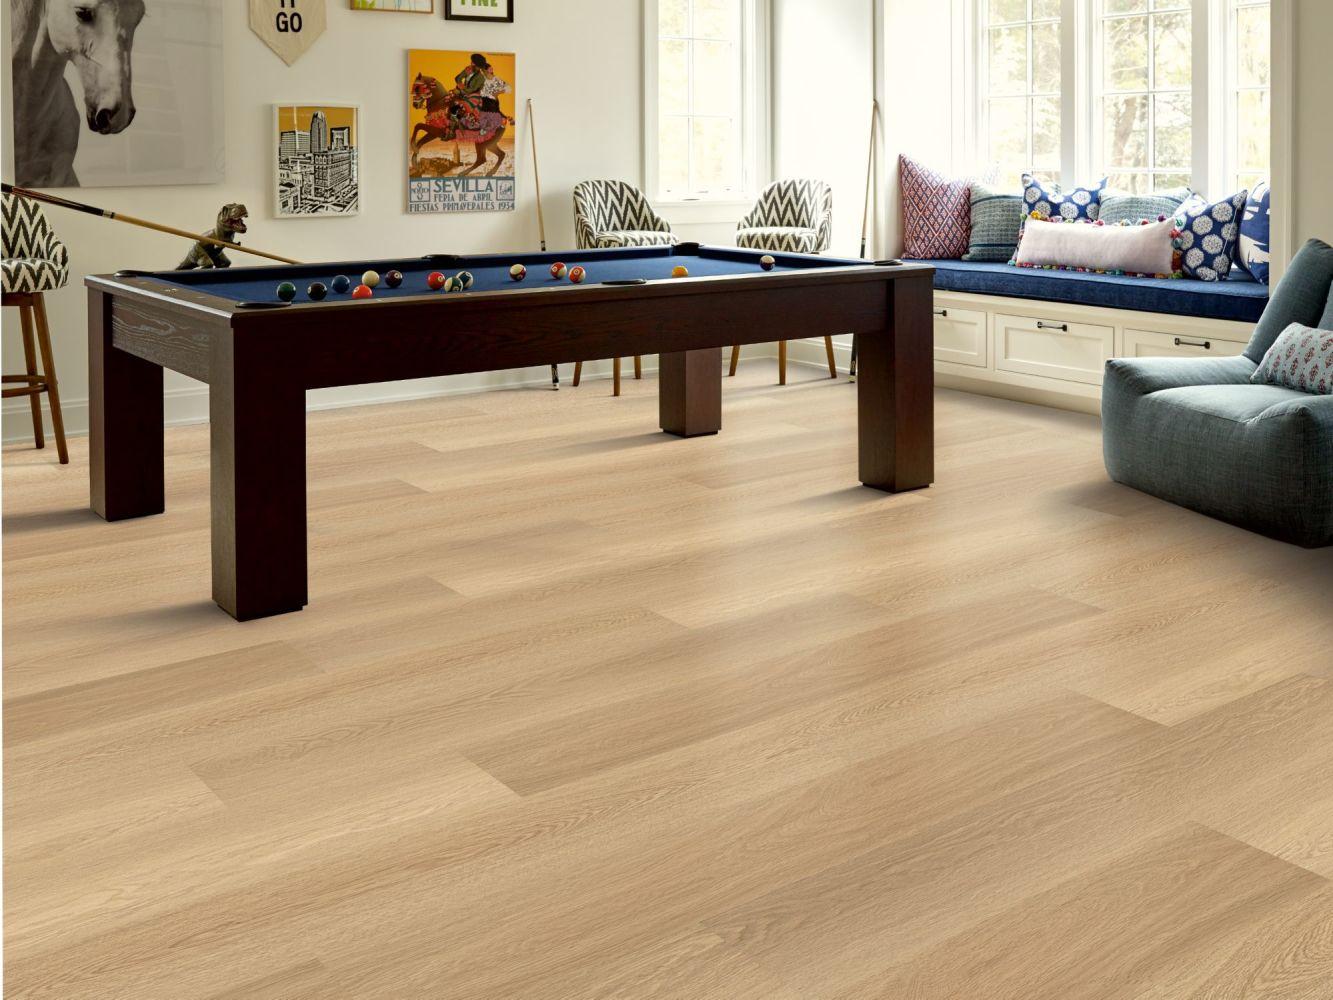 Shaw Floors Nfa HS Ventura Castaway 07087_VH542